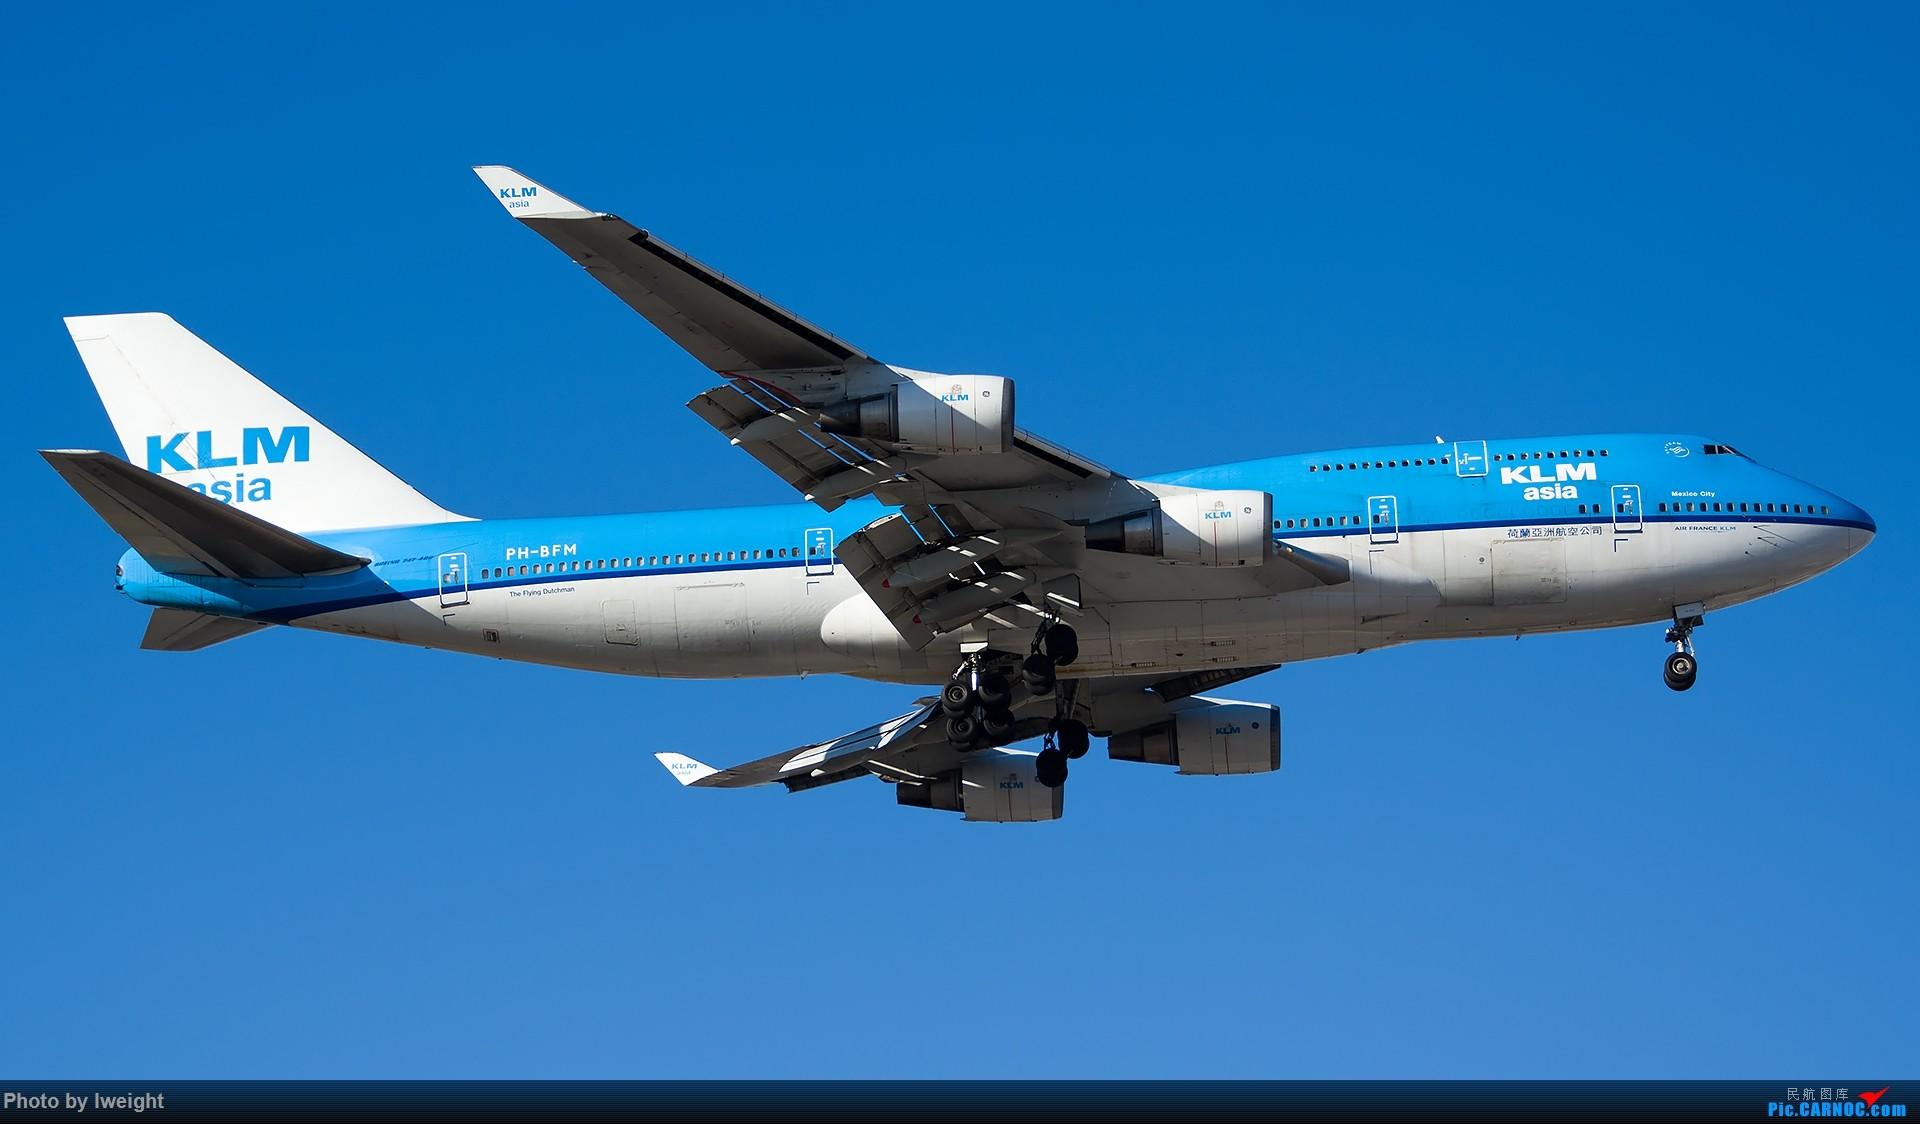 Re:[原创]北京难得的好天气,随手拍了一些渣图【2015-01-27】 BOEING 747-400 PH-BFM 中国北京首都国际机场